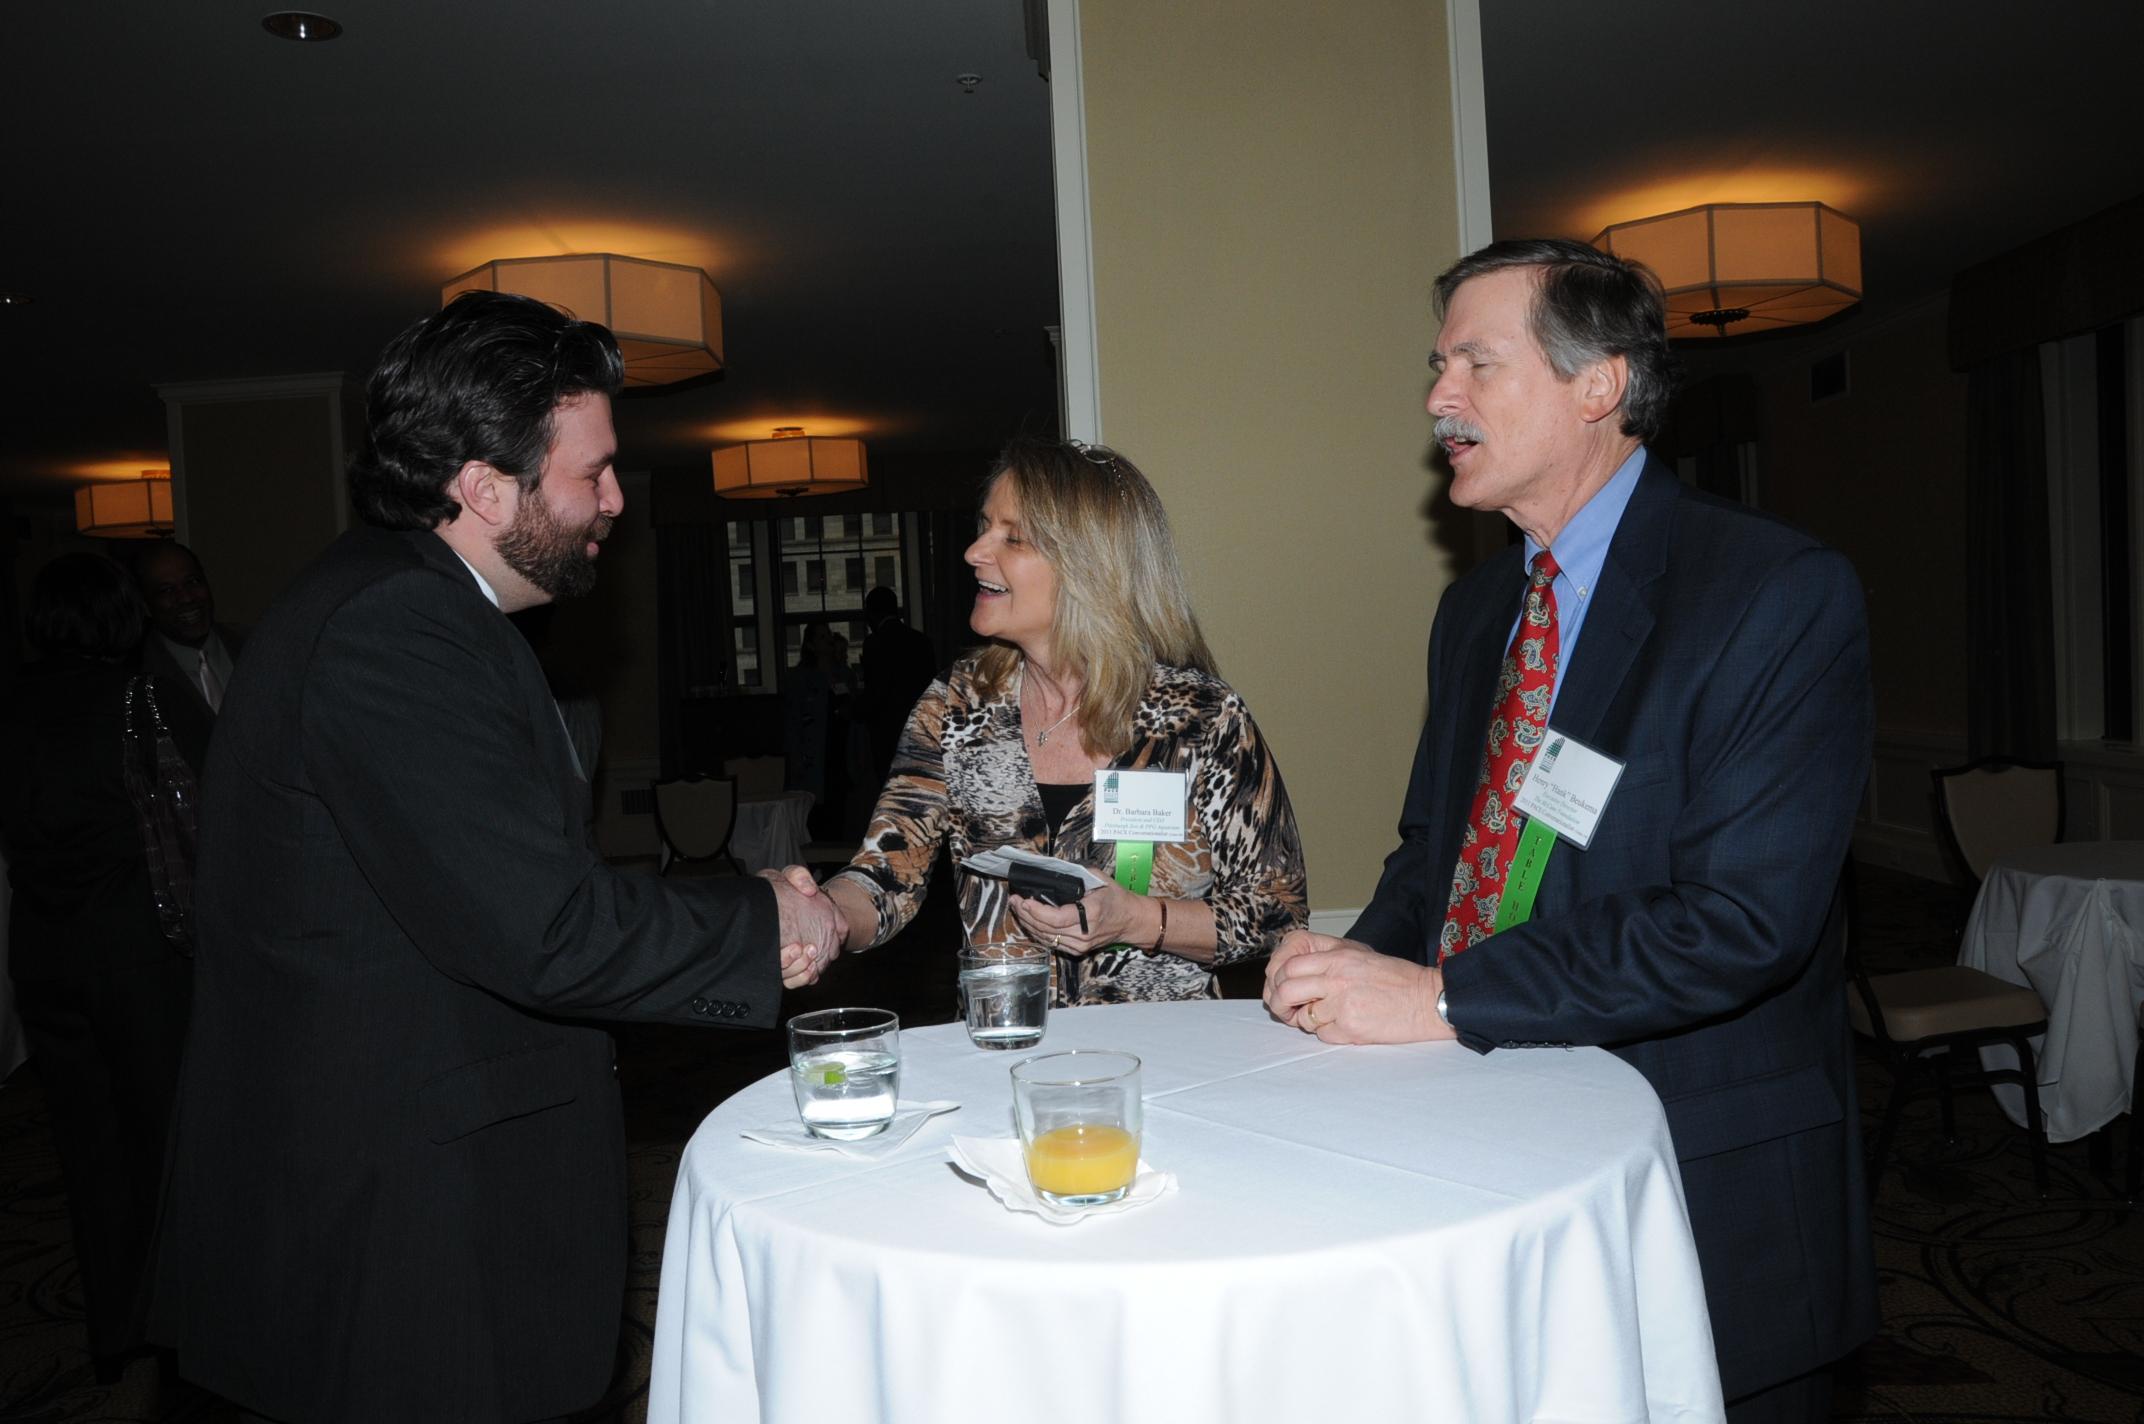 Dr. Barbara Baker, Henry Beukema & Keith Caldwell.JPG